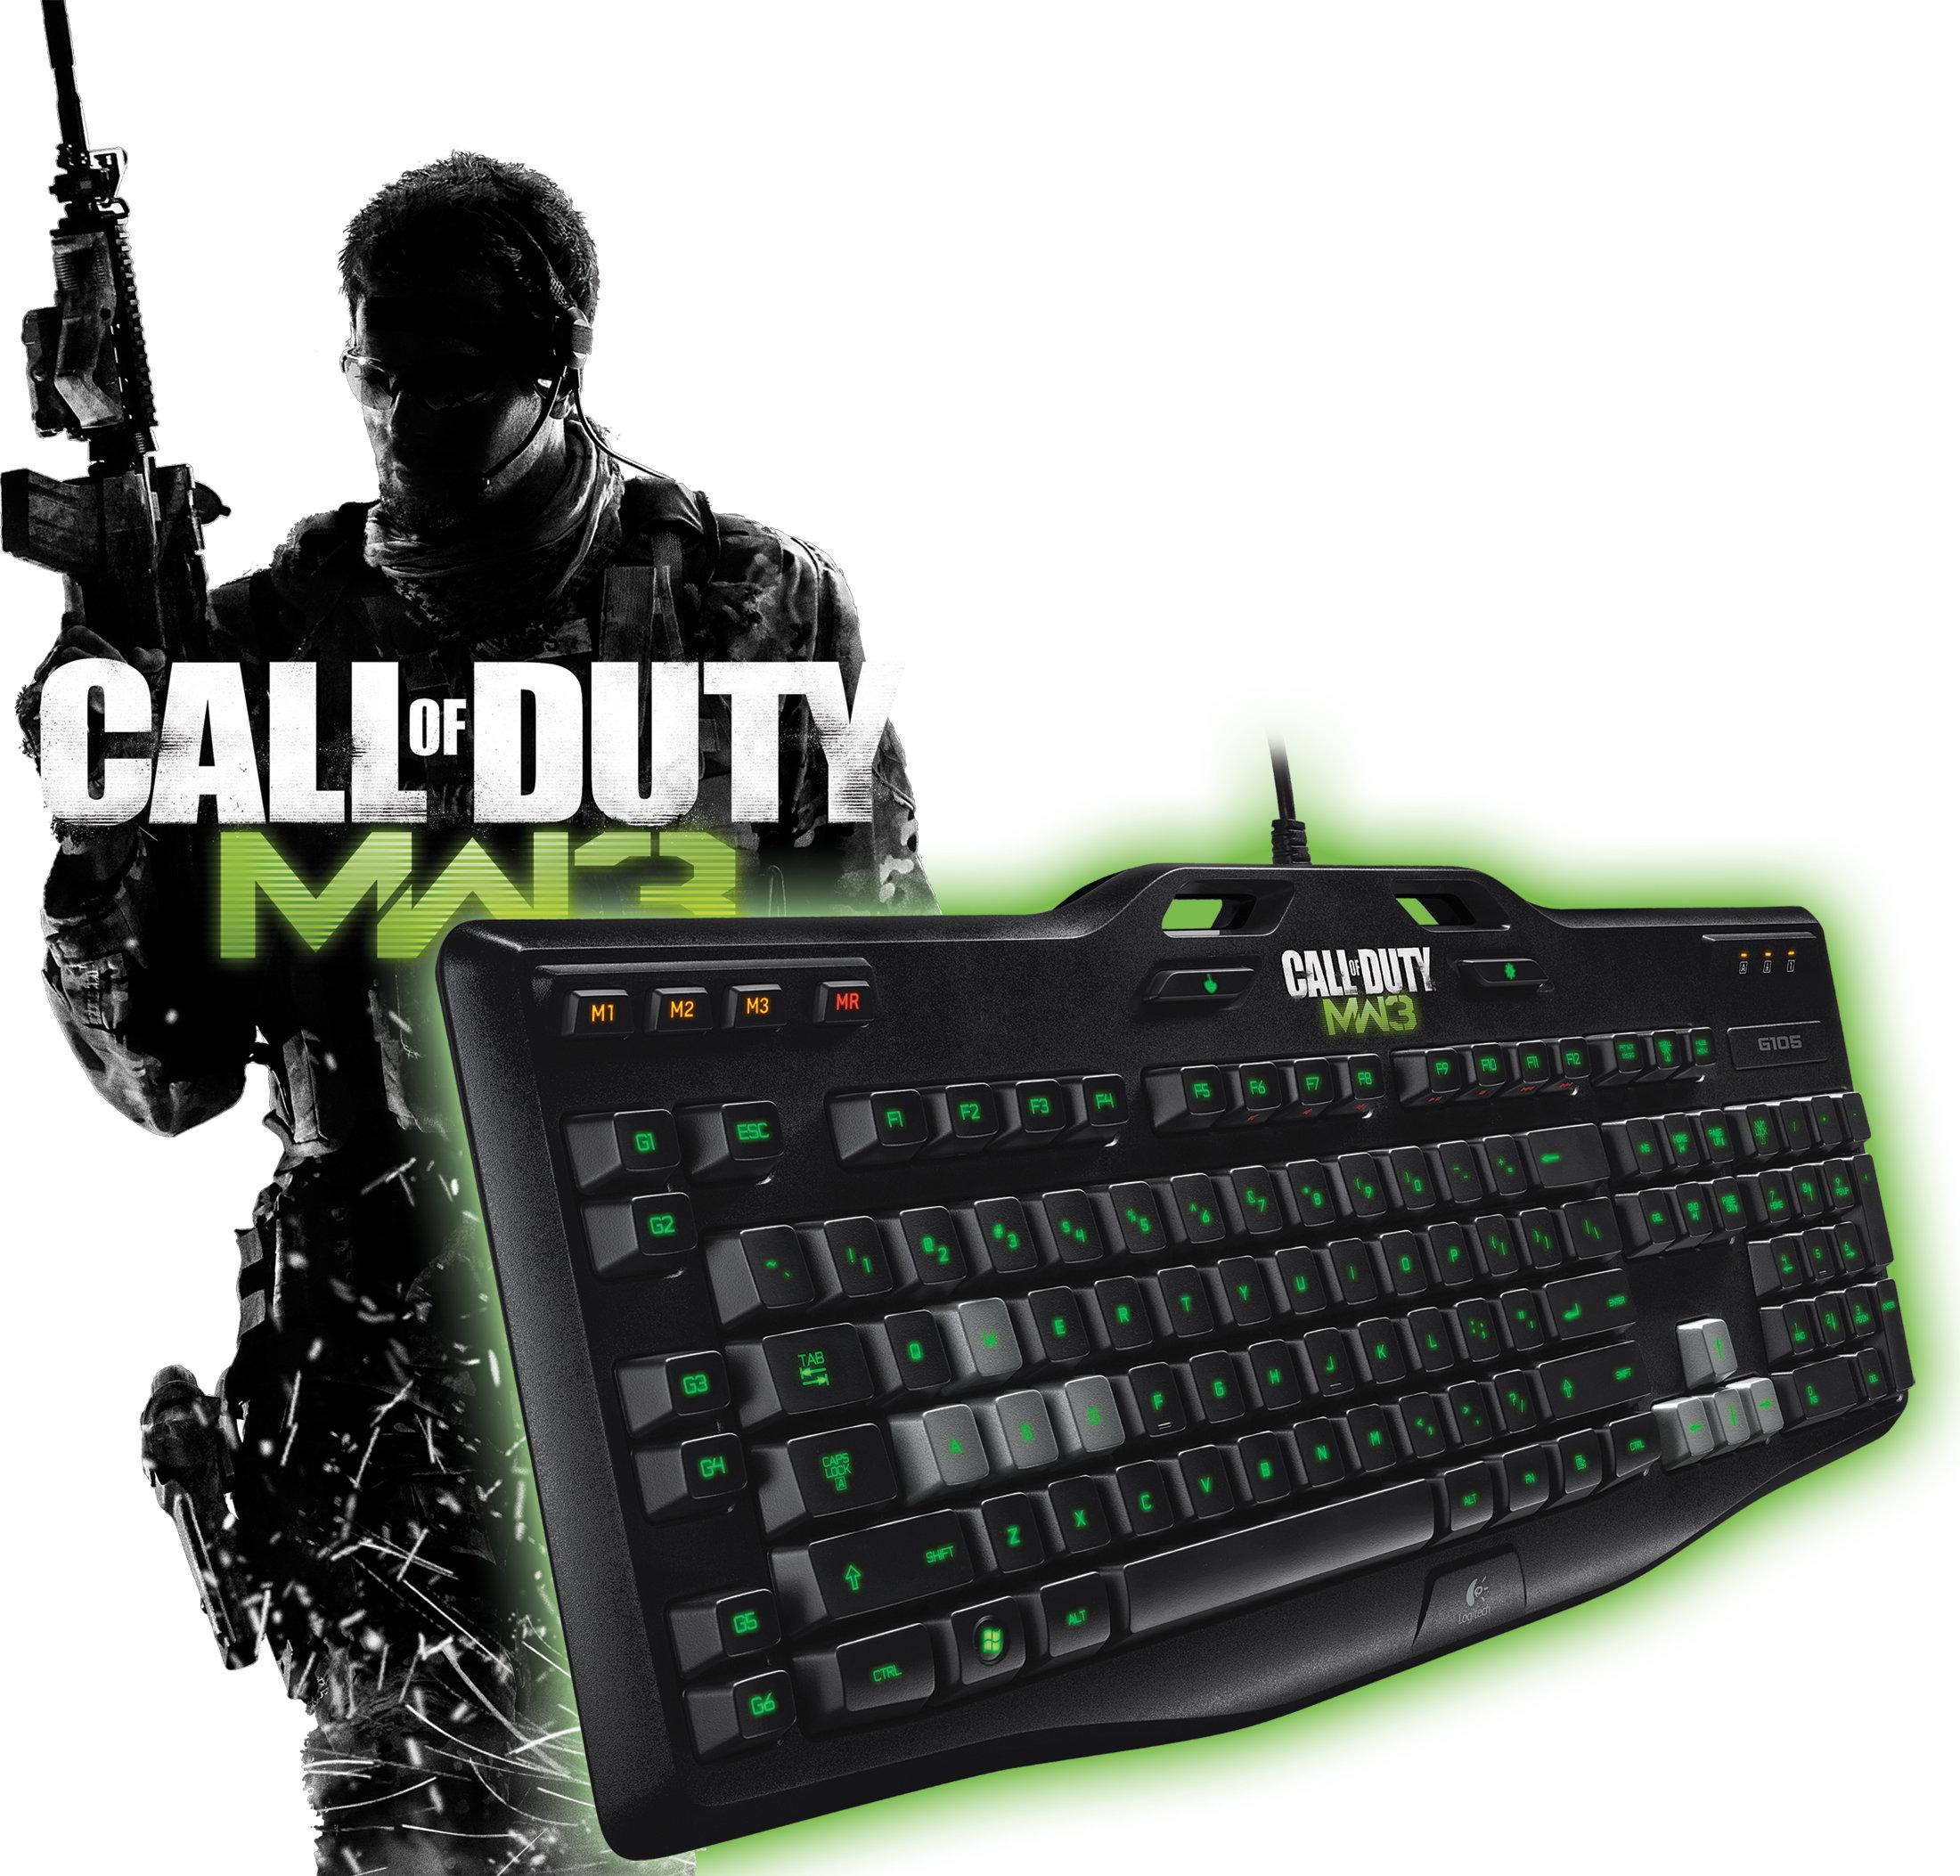 Logitech G105 Call Of Duty Gaming Keyboard Amazon Co Uk